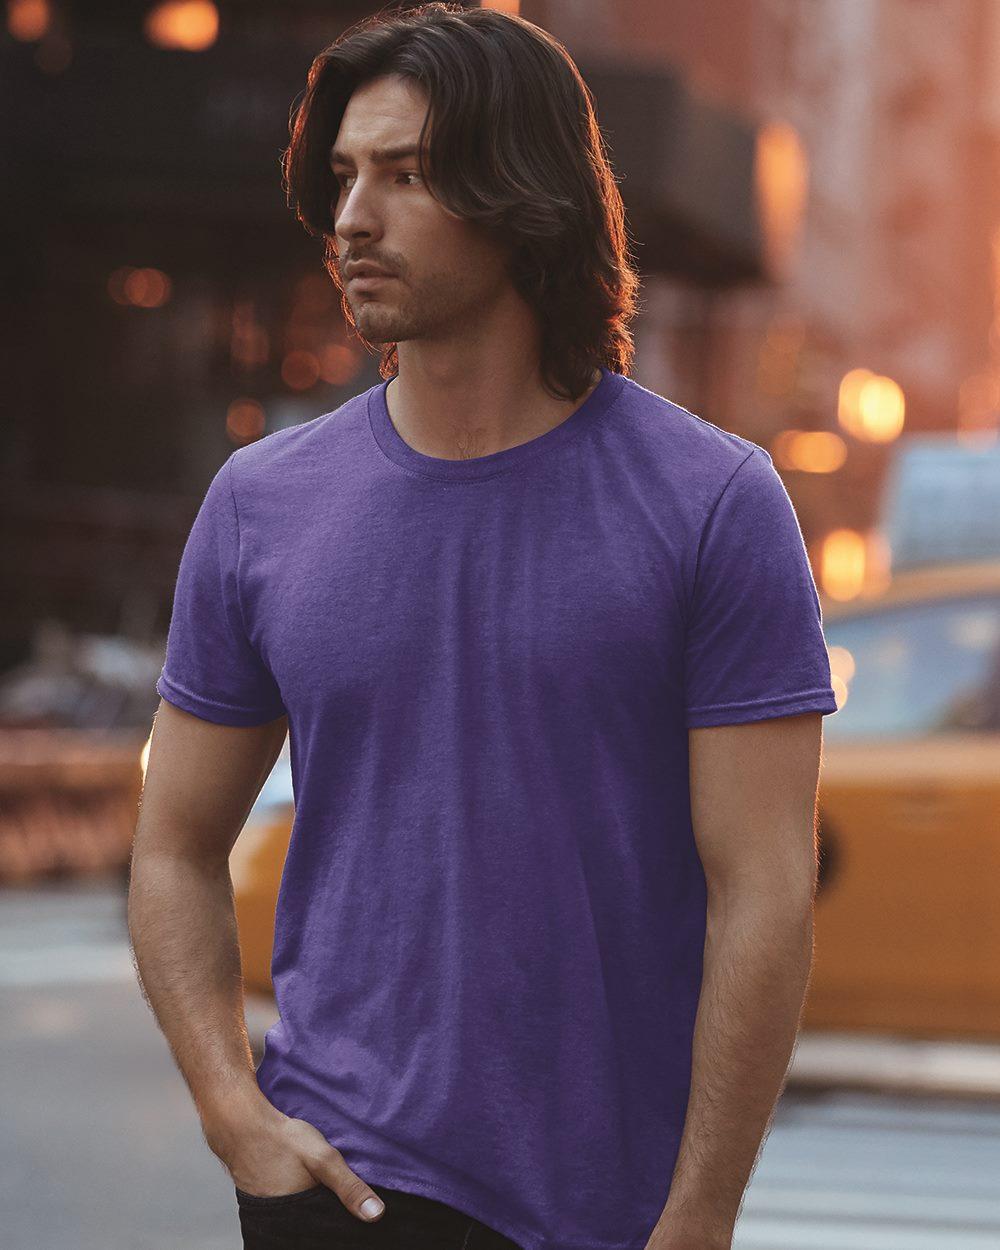 Anvil Triblend Crewneck T-Shirt - 6750             Starting at $5.50 Black